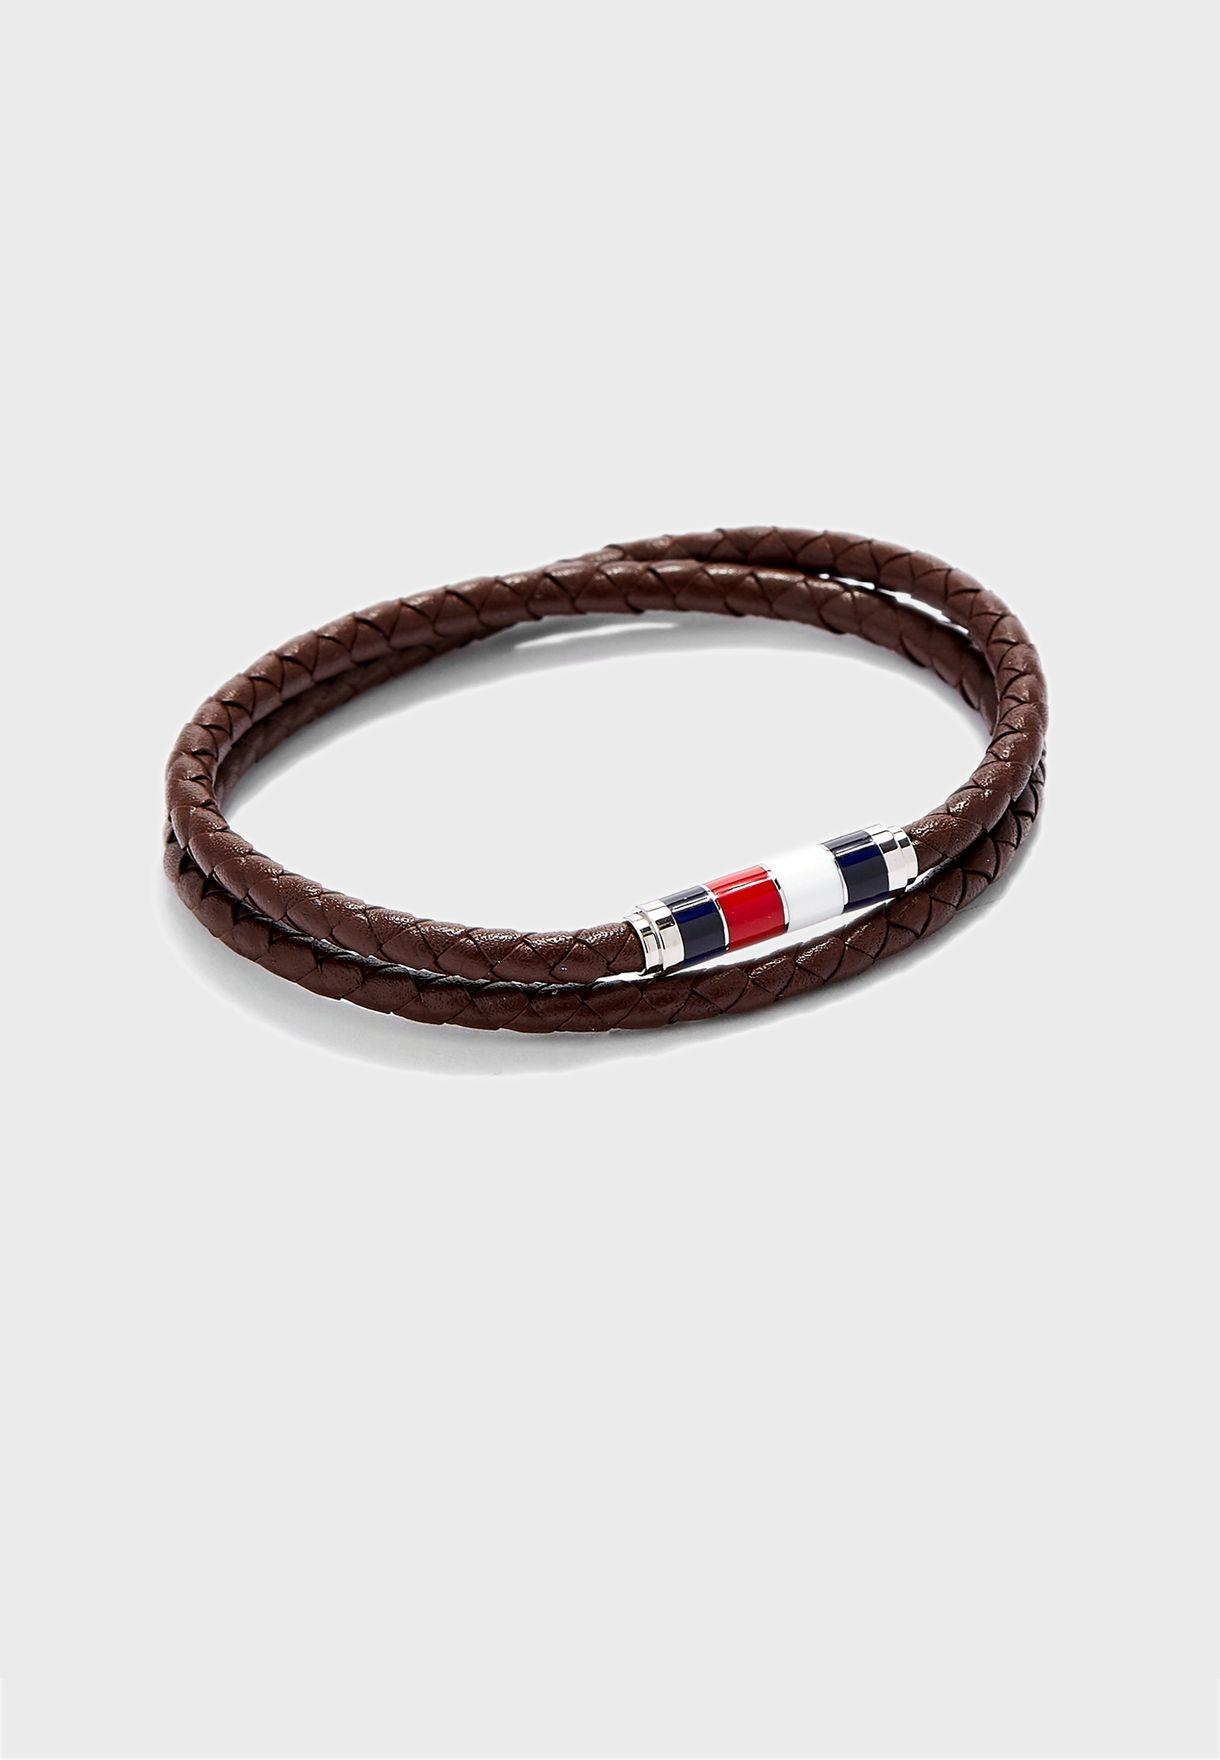 2770047 Chronograph Analog & Bracelet Gift Set